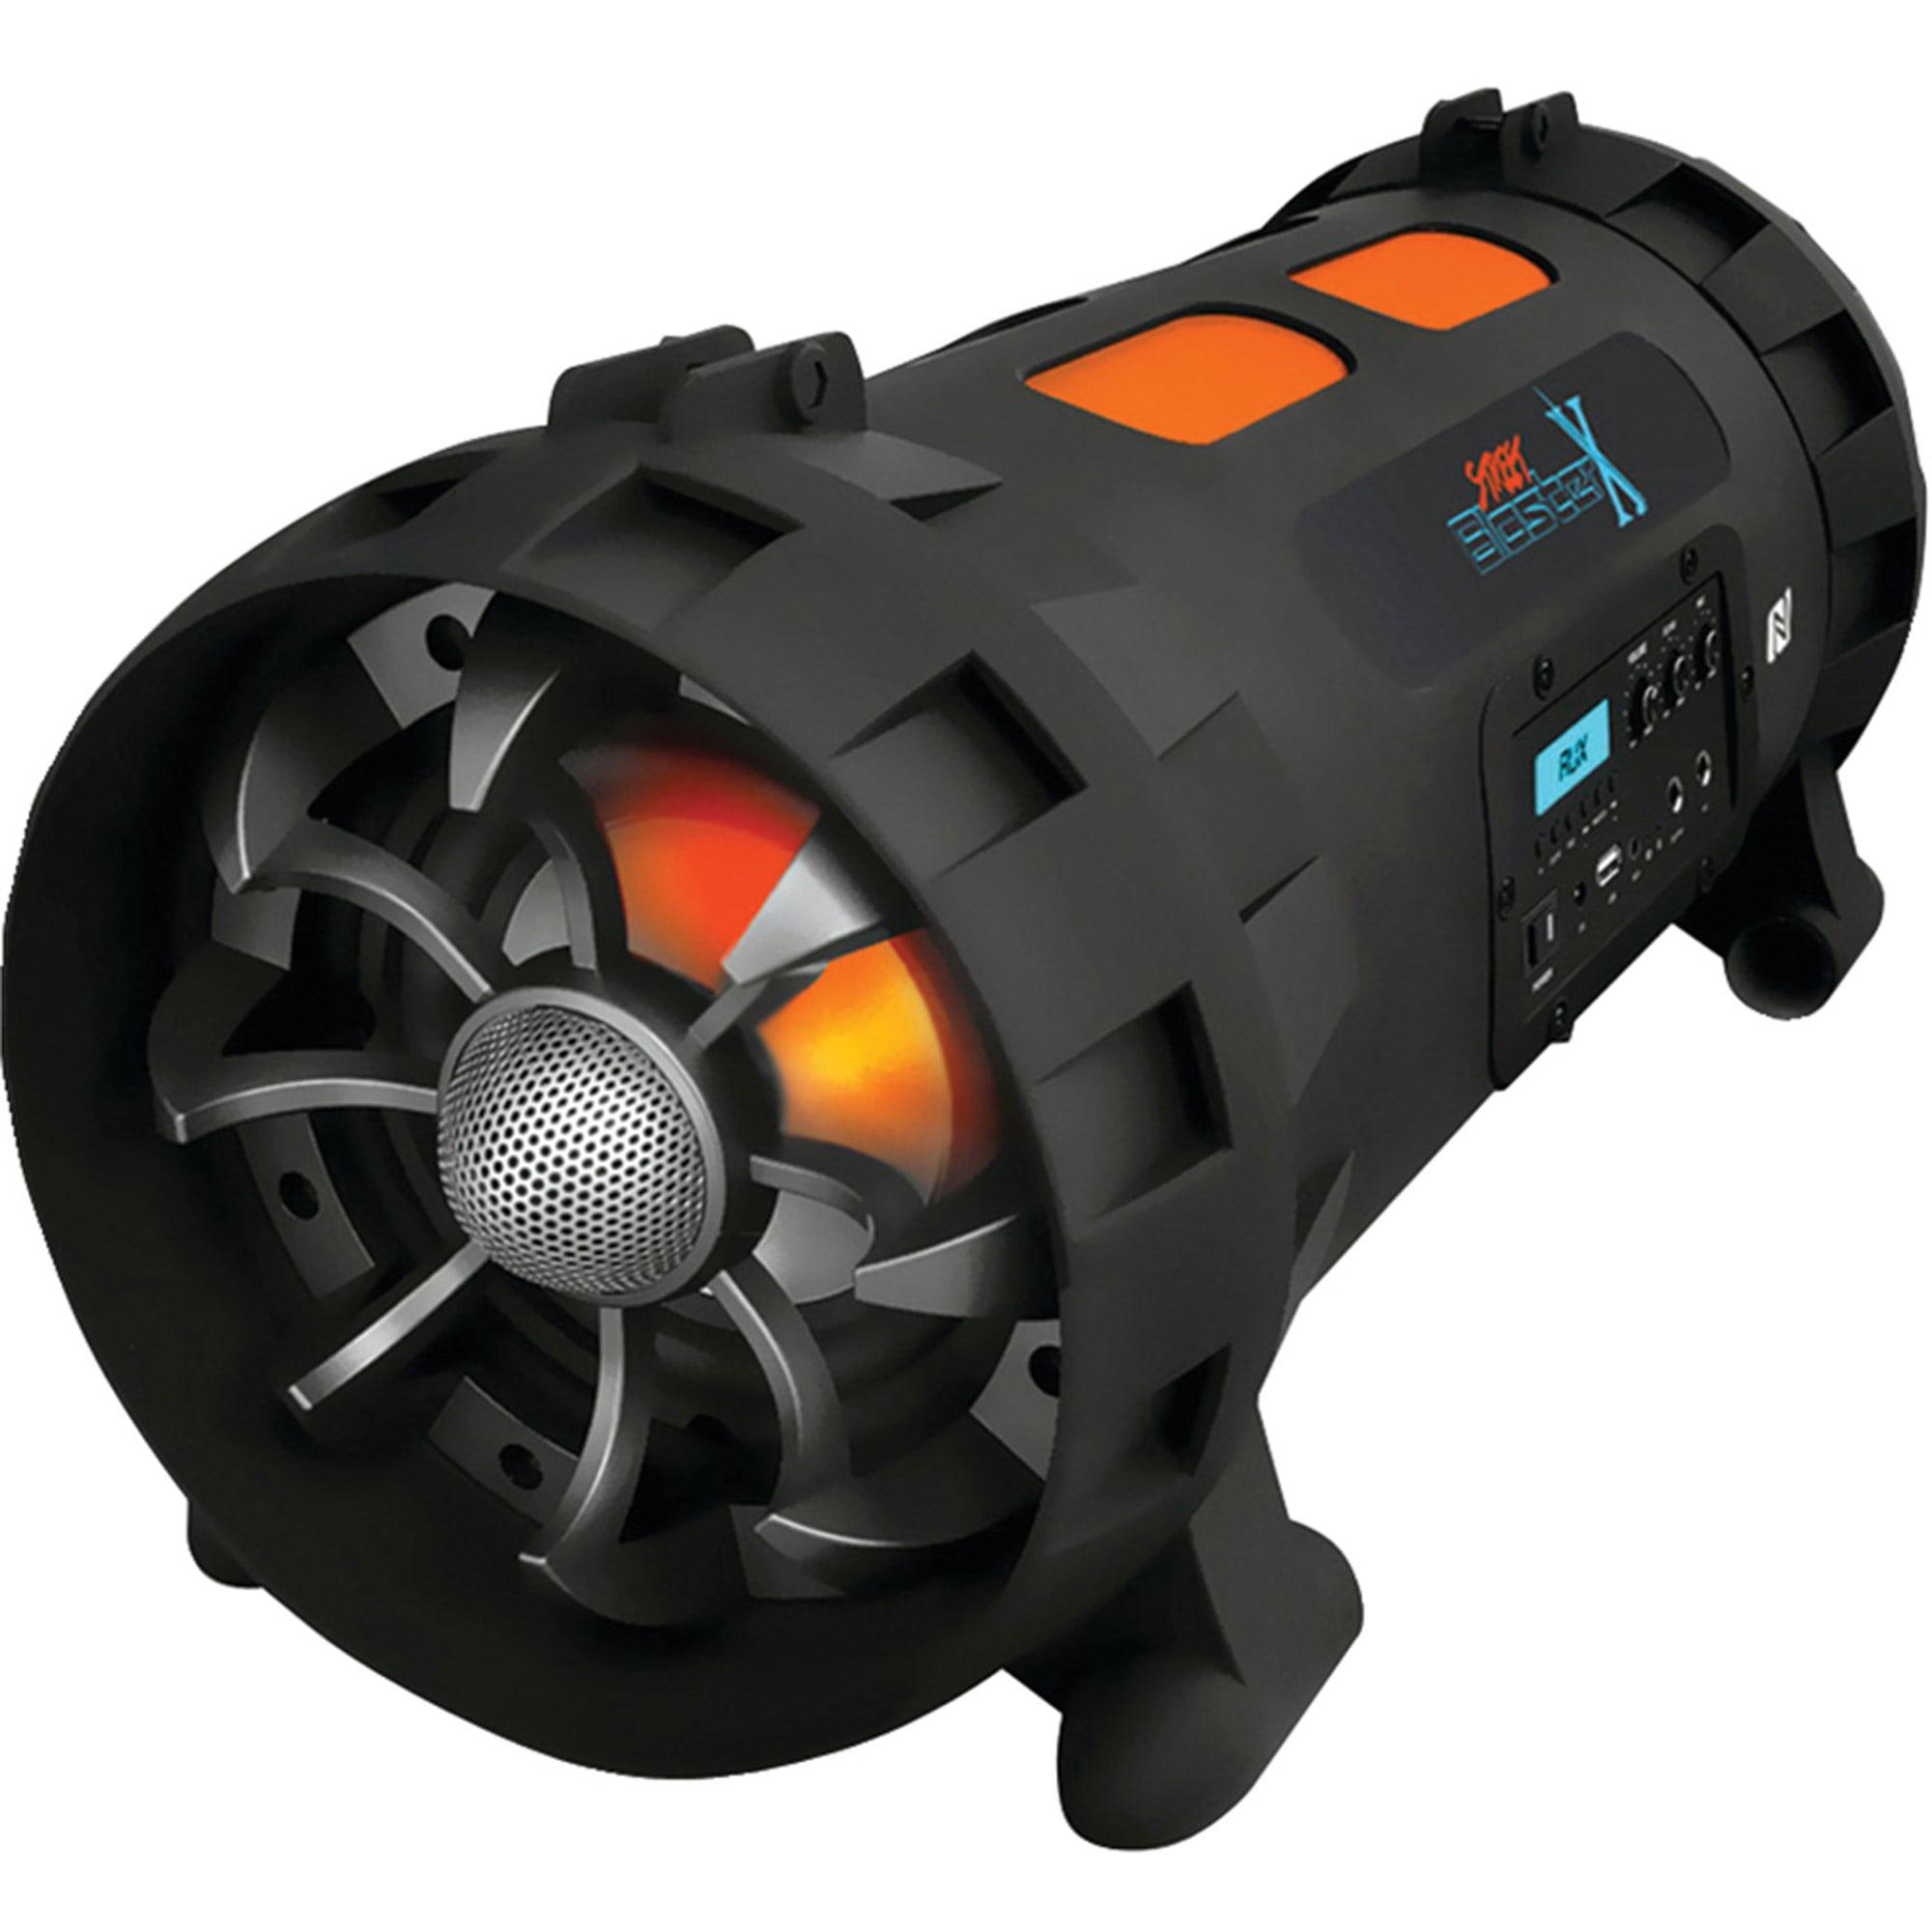 Pyle PBMSPG200 Street Blaster X Portable BoomBox Speaker System